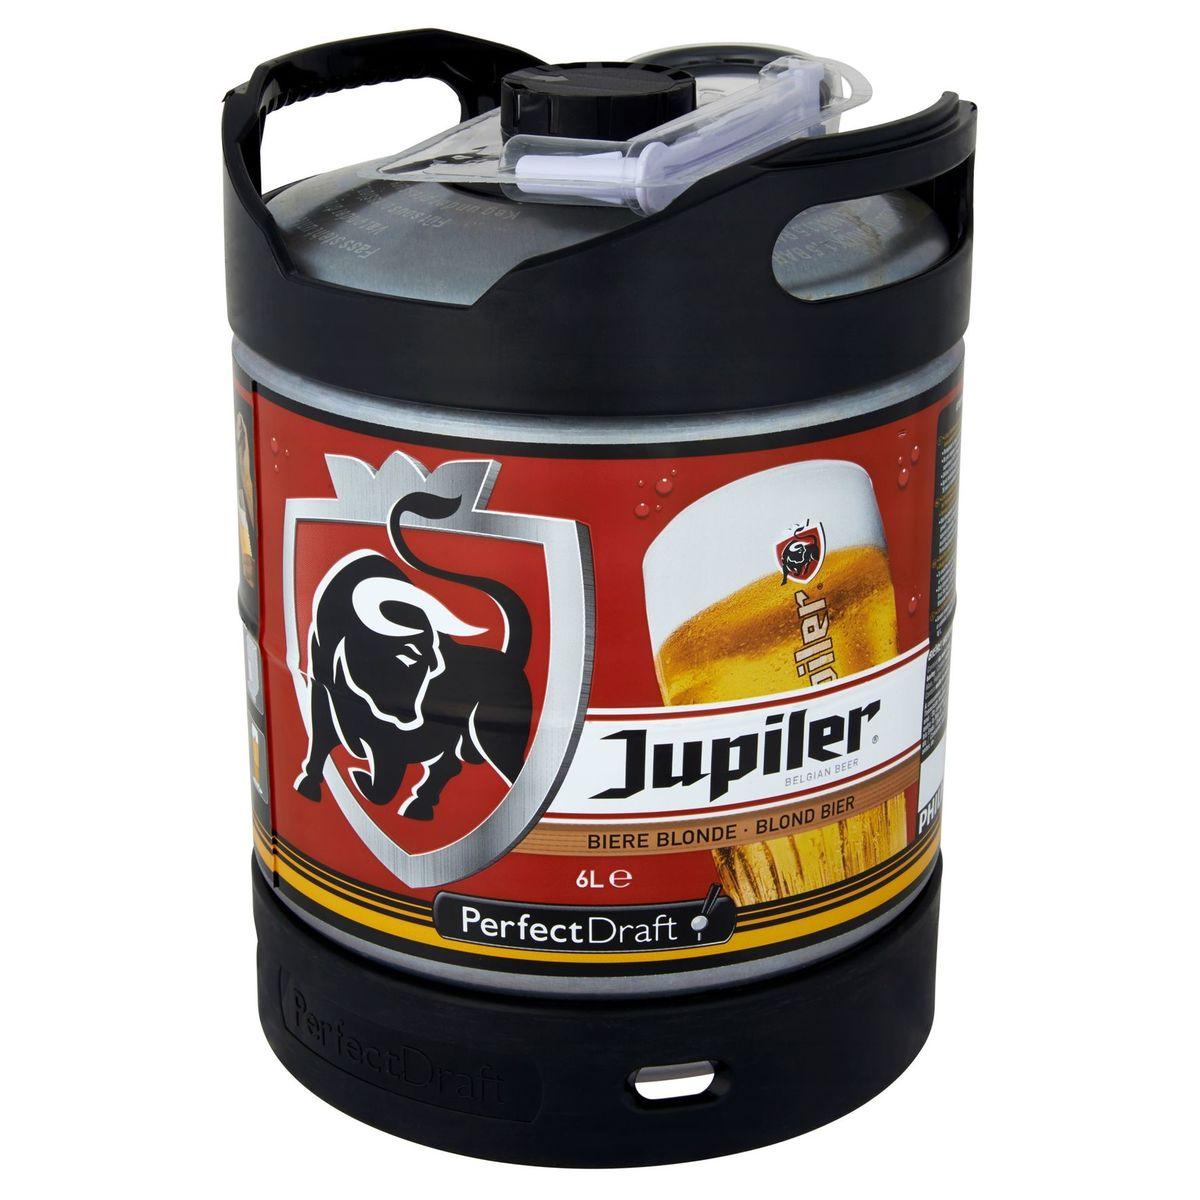 Jupiler Perfect Draft Blond Bier Tapvat 6 L